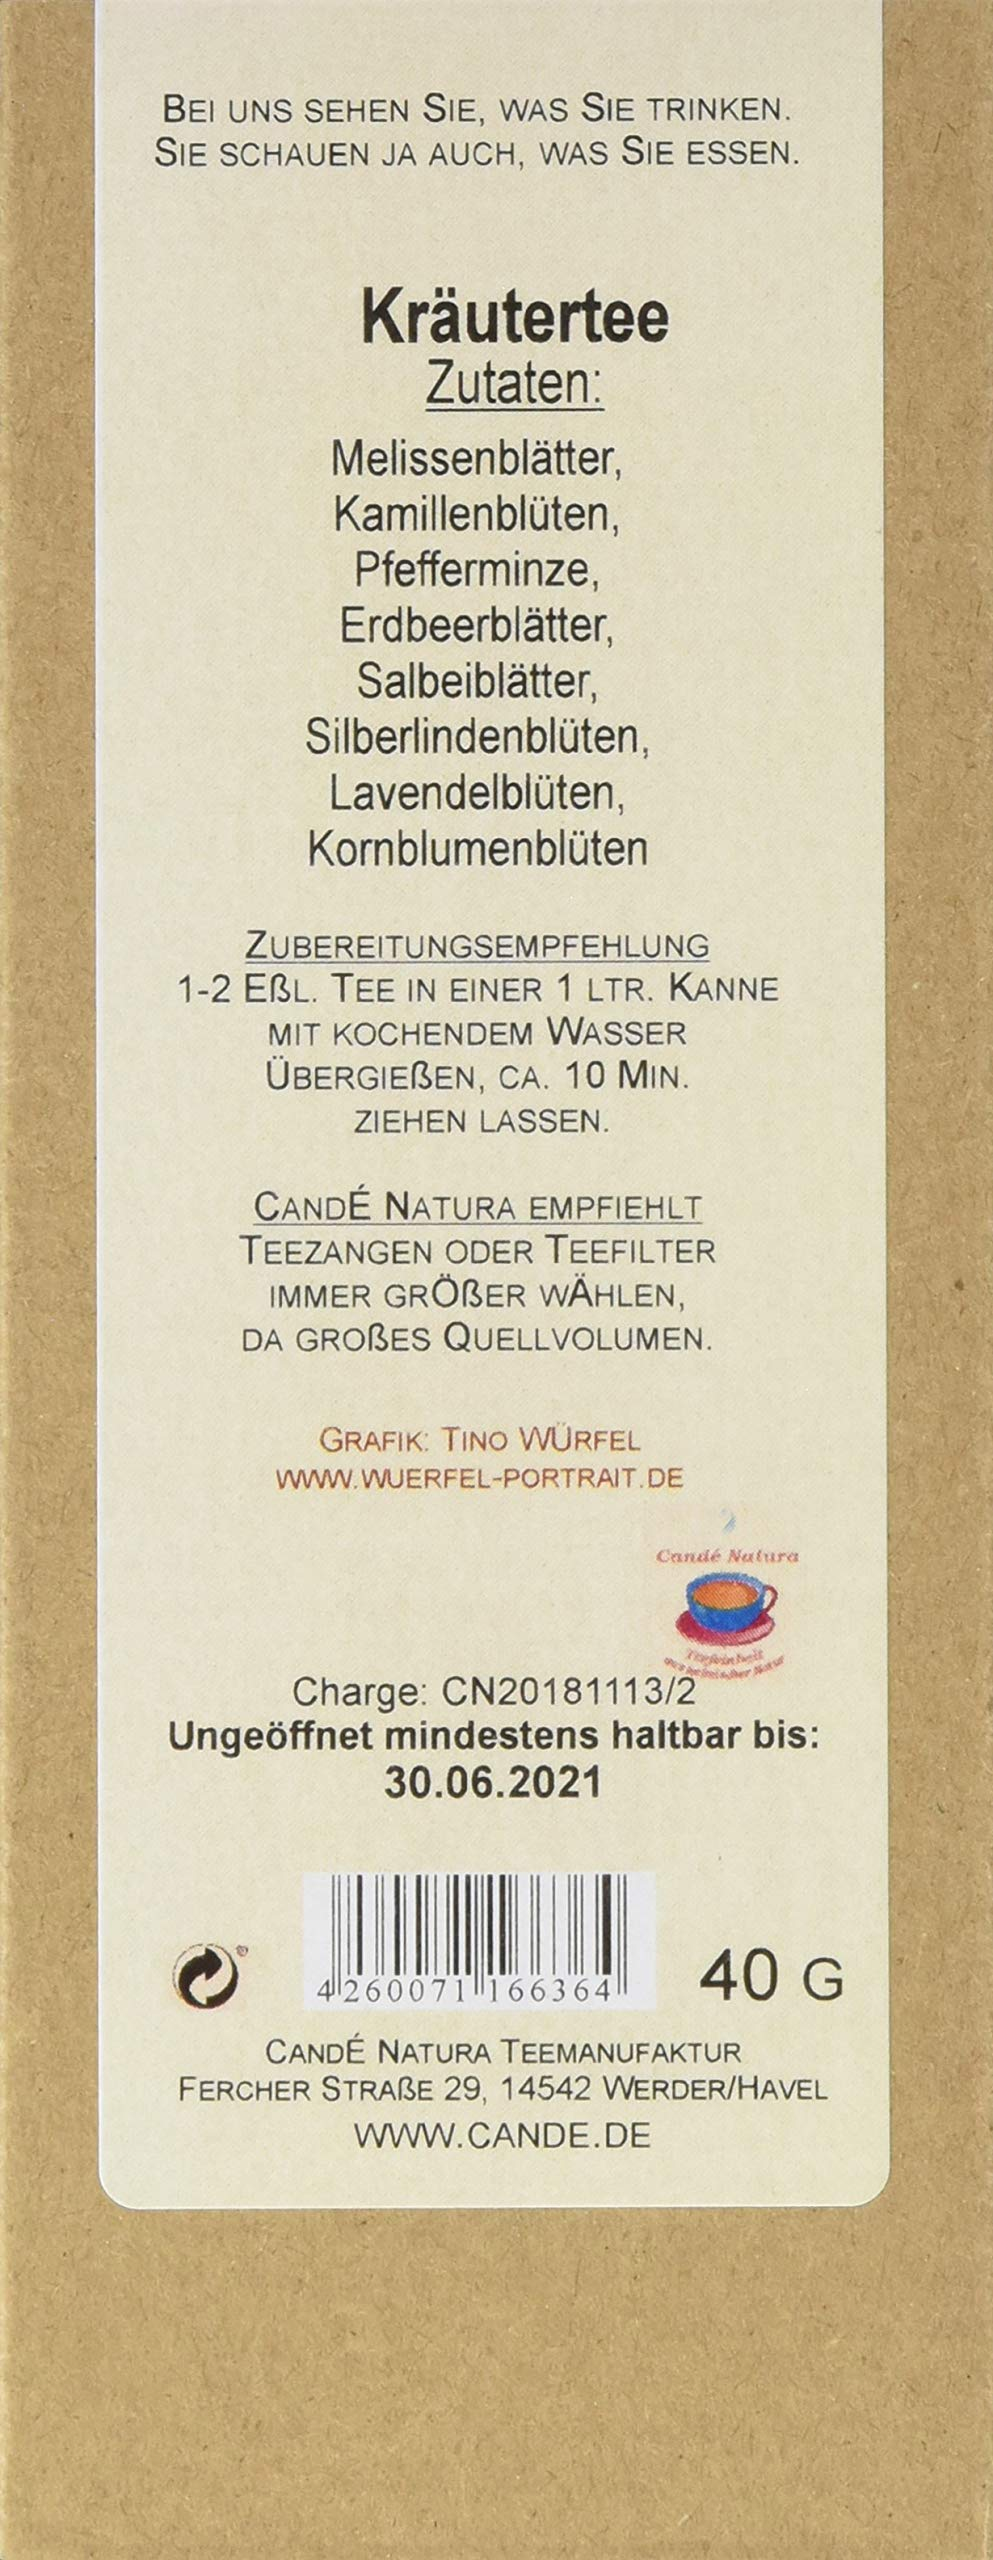 Cand-Natura-Teemanufaktur-Gut-Fr-Ihn-Kruterteemischung-5er-Pack-5-x-40-g